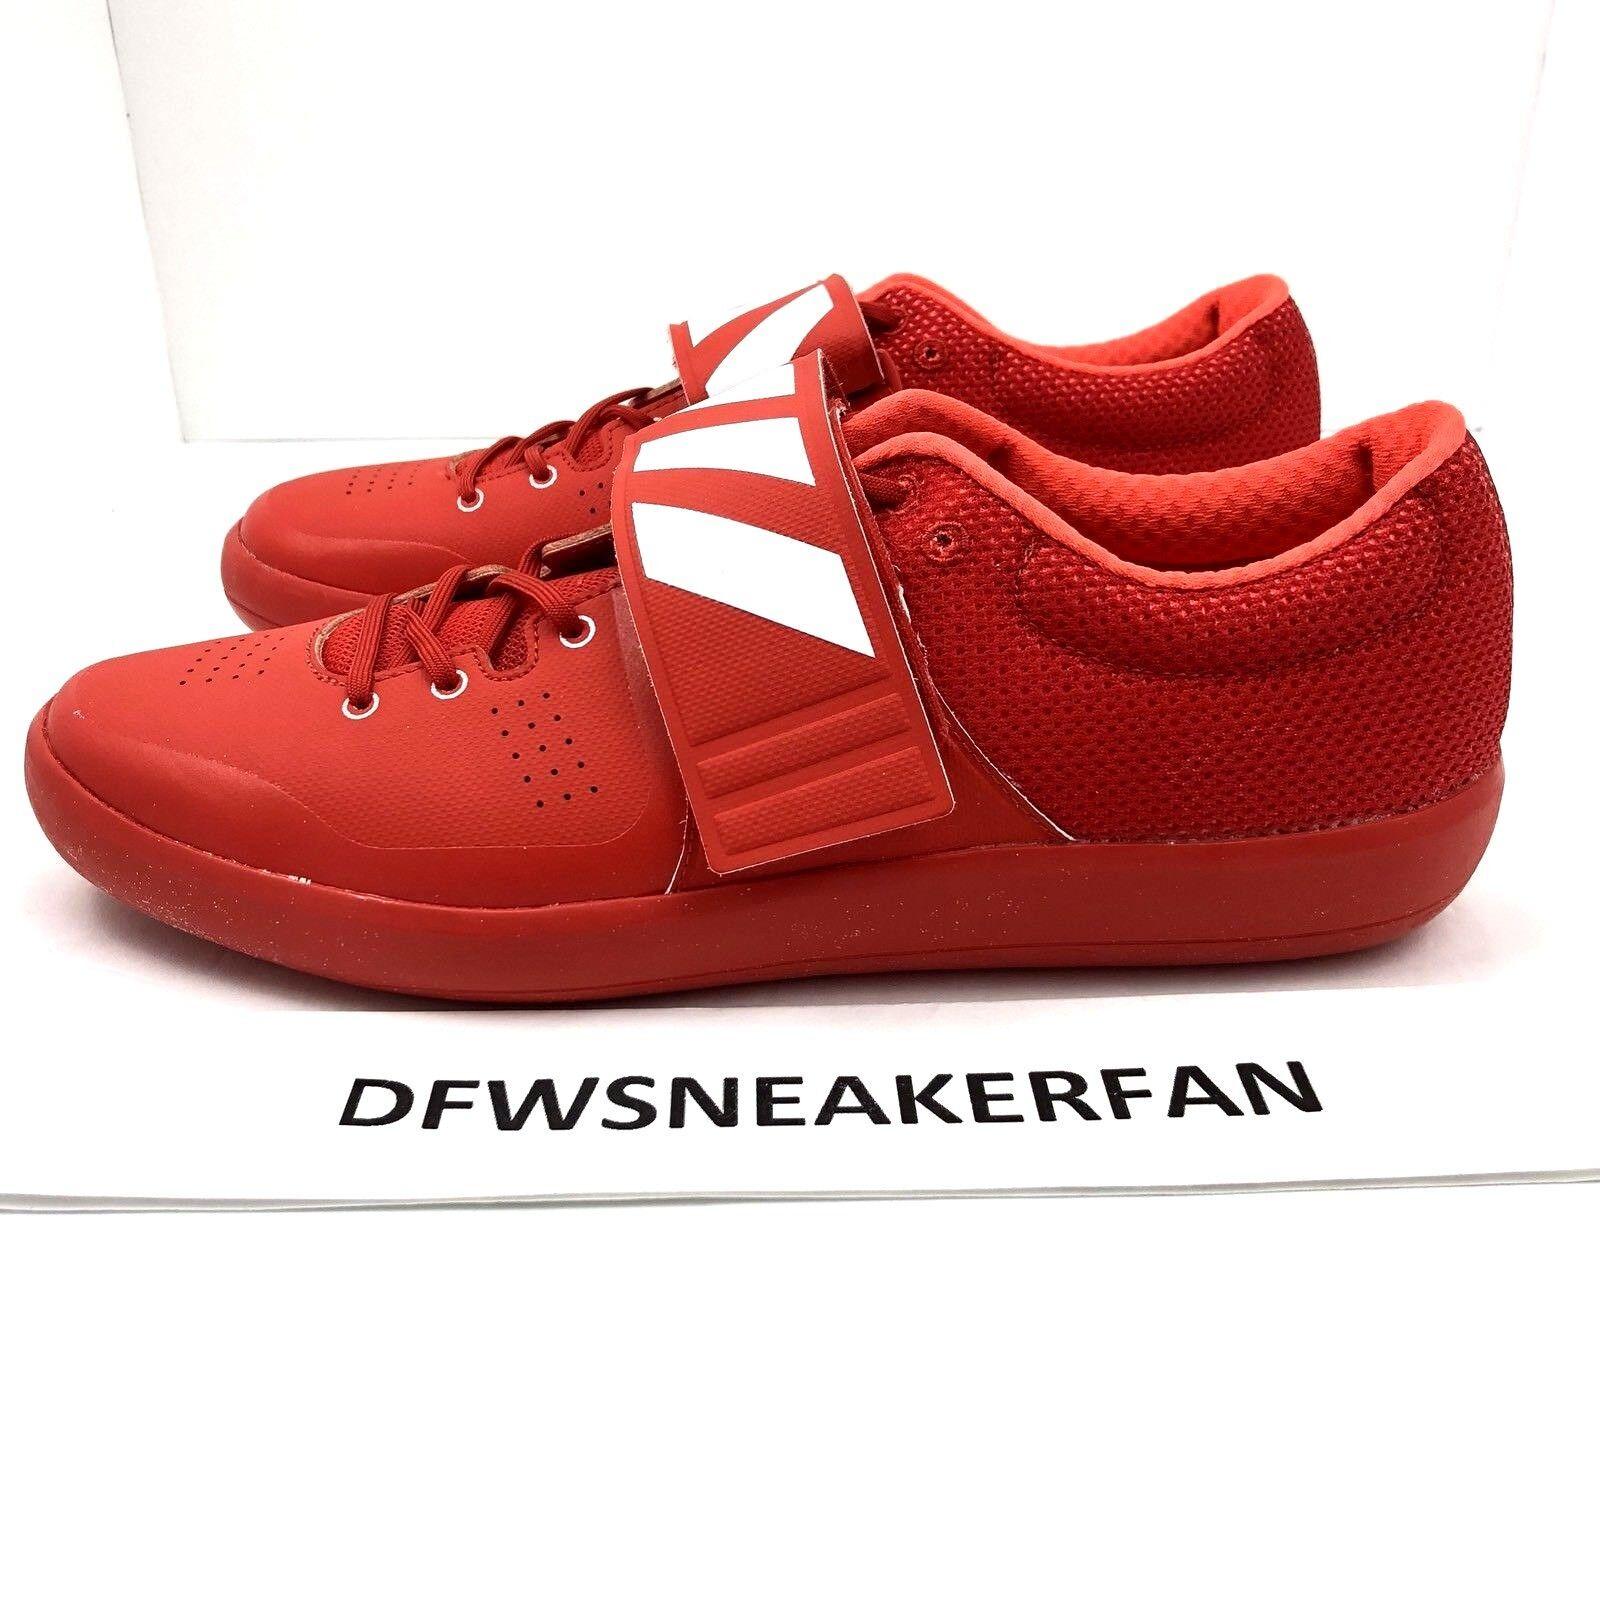 Nuevo adidas adizero Rio shotput bb4118 2 disco martillo Rojo bb4118 shotput SZ 10,5 zapato de la pista 4f4ed0